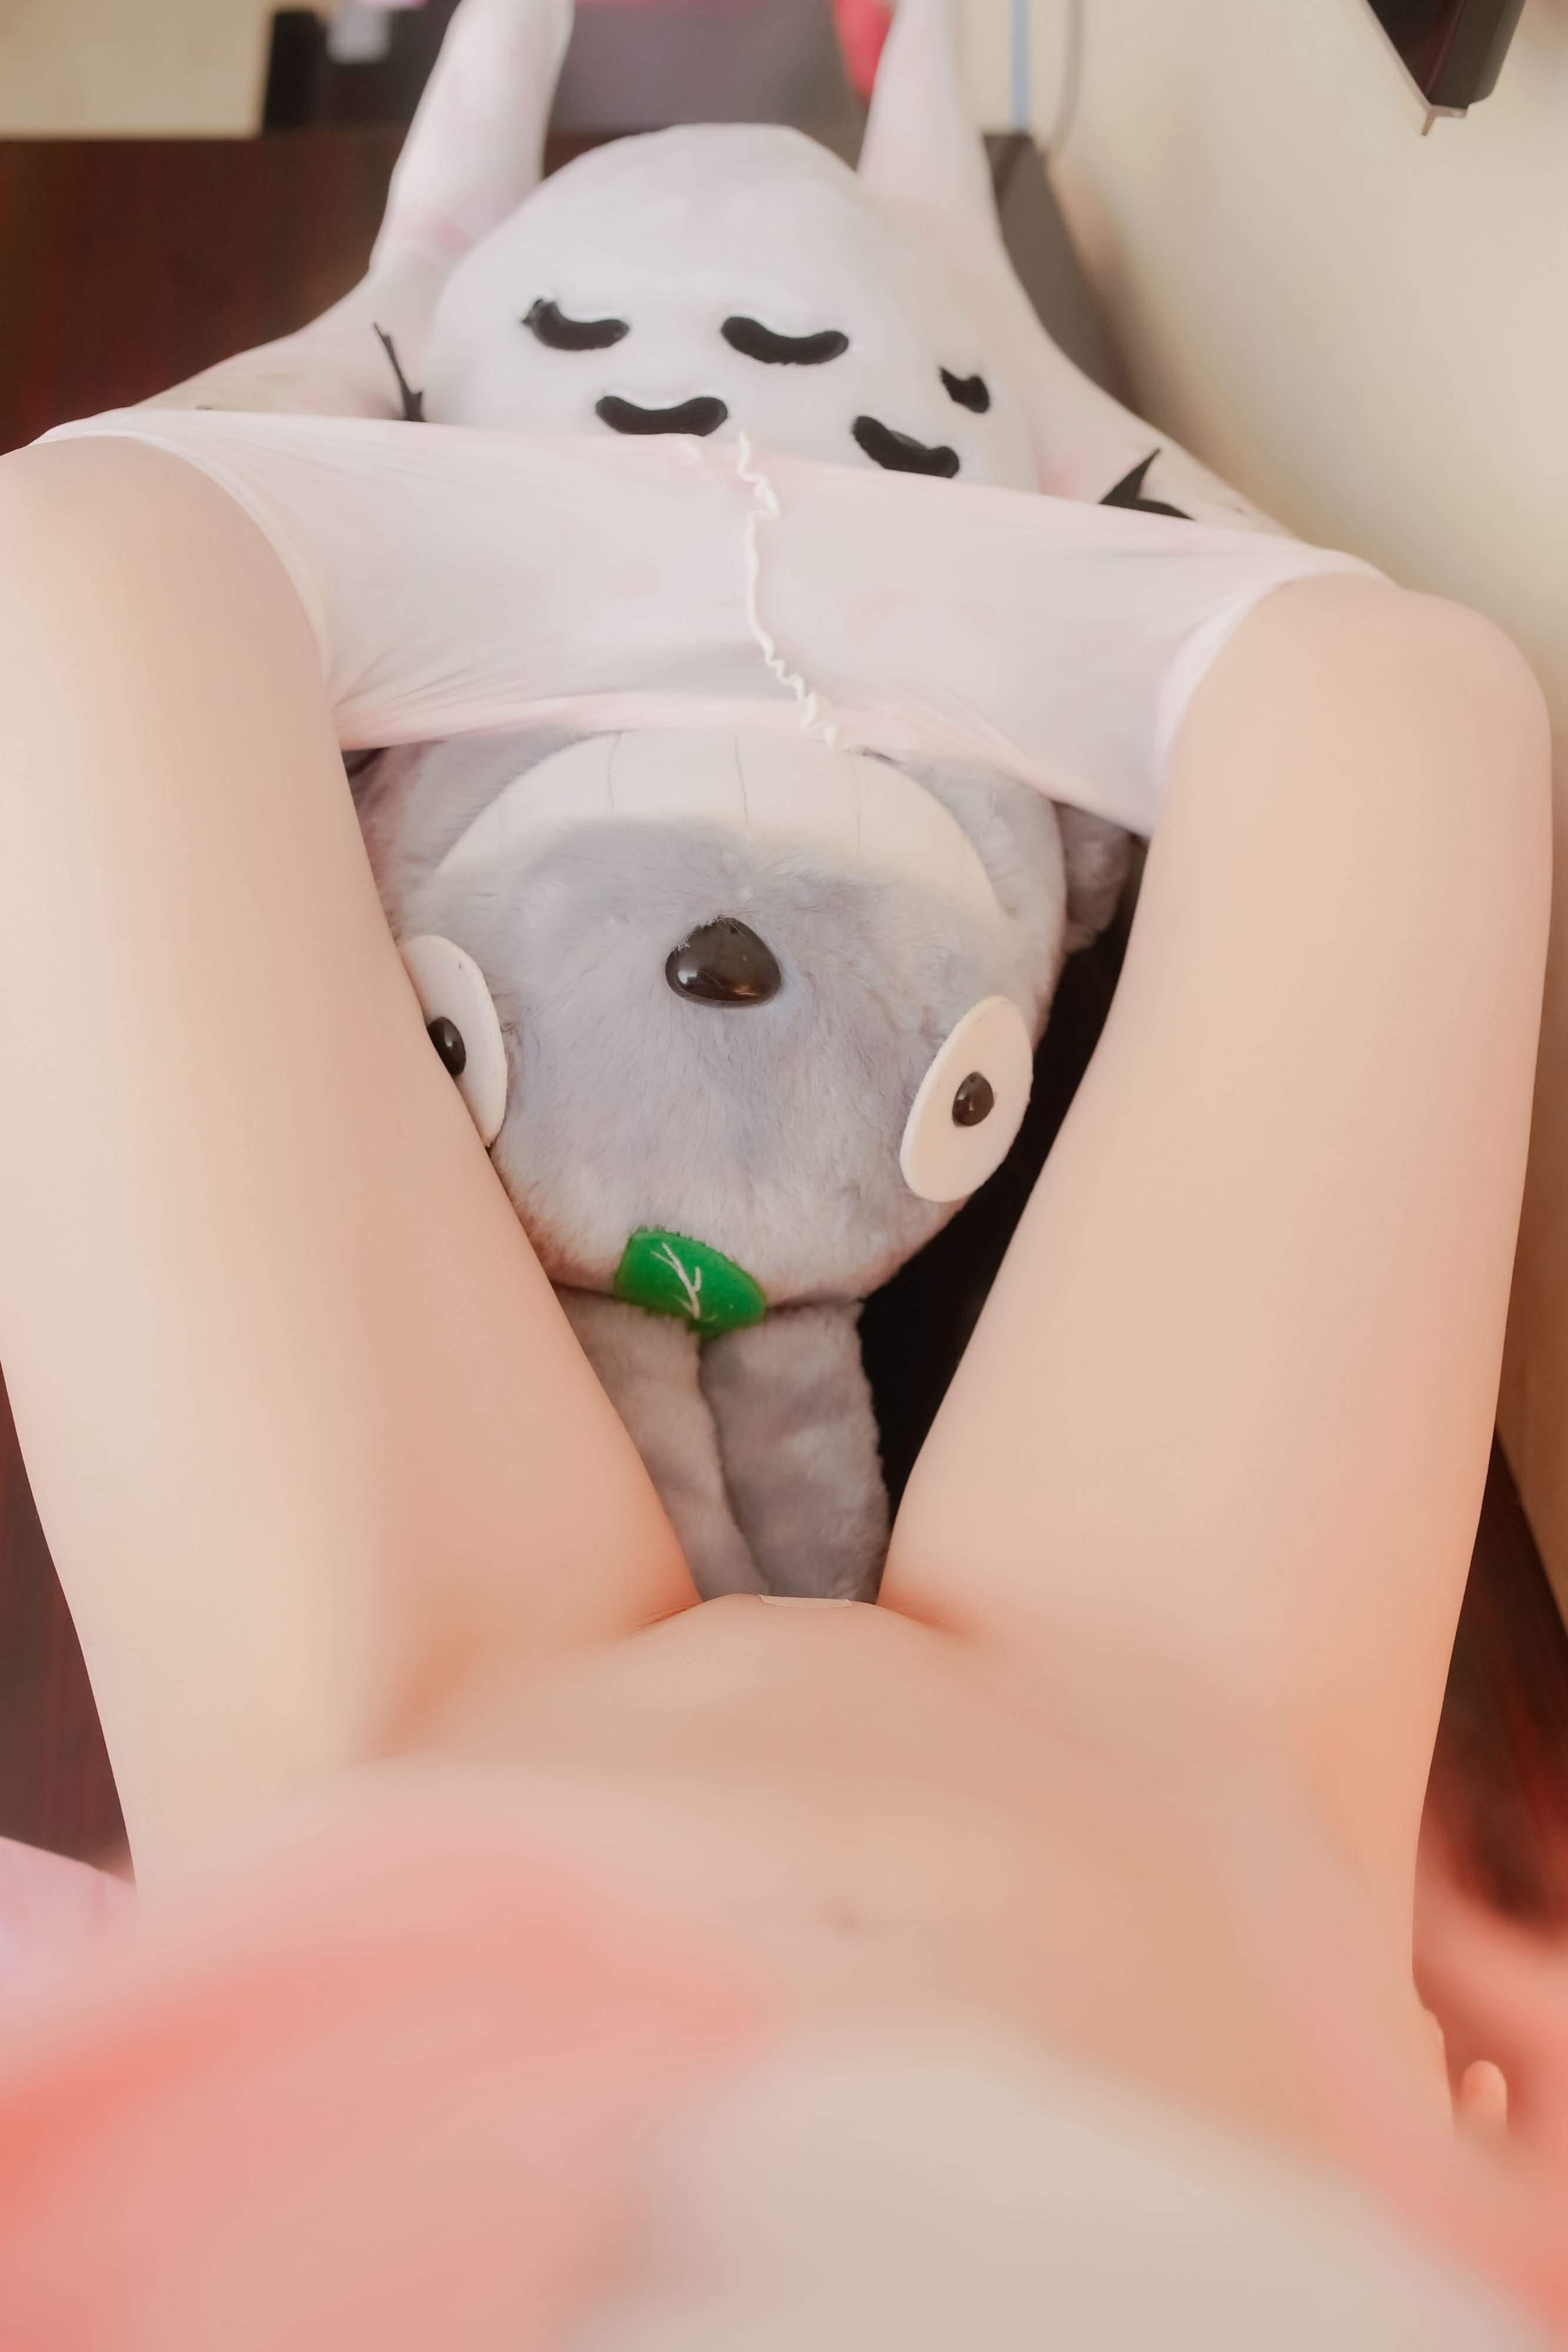 y7iCdD - 【The Girl Theater】 少女映画 Cosplay 龙猫与少女 90P